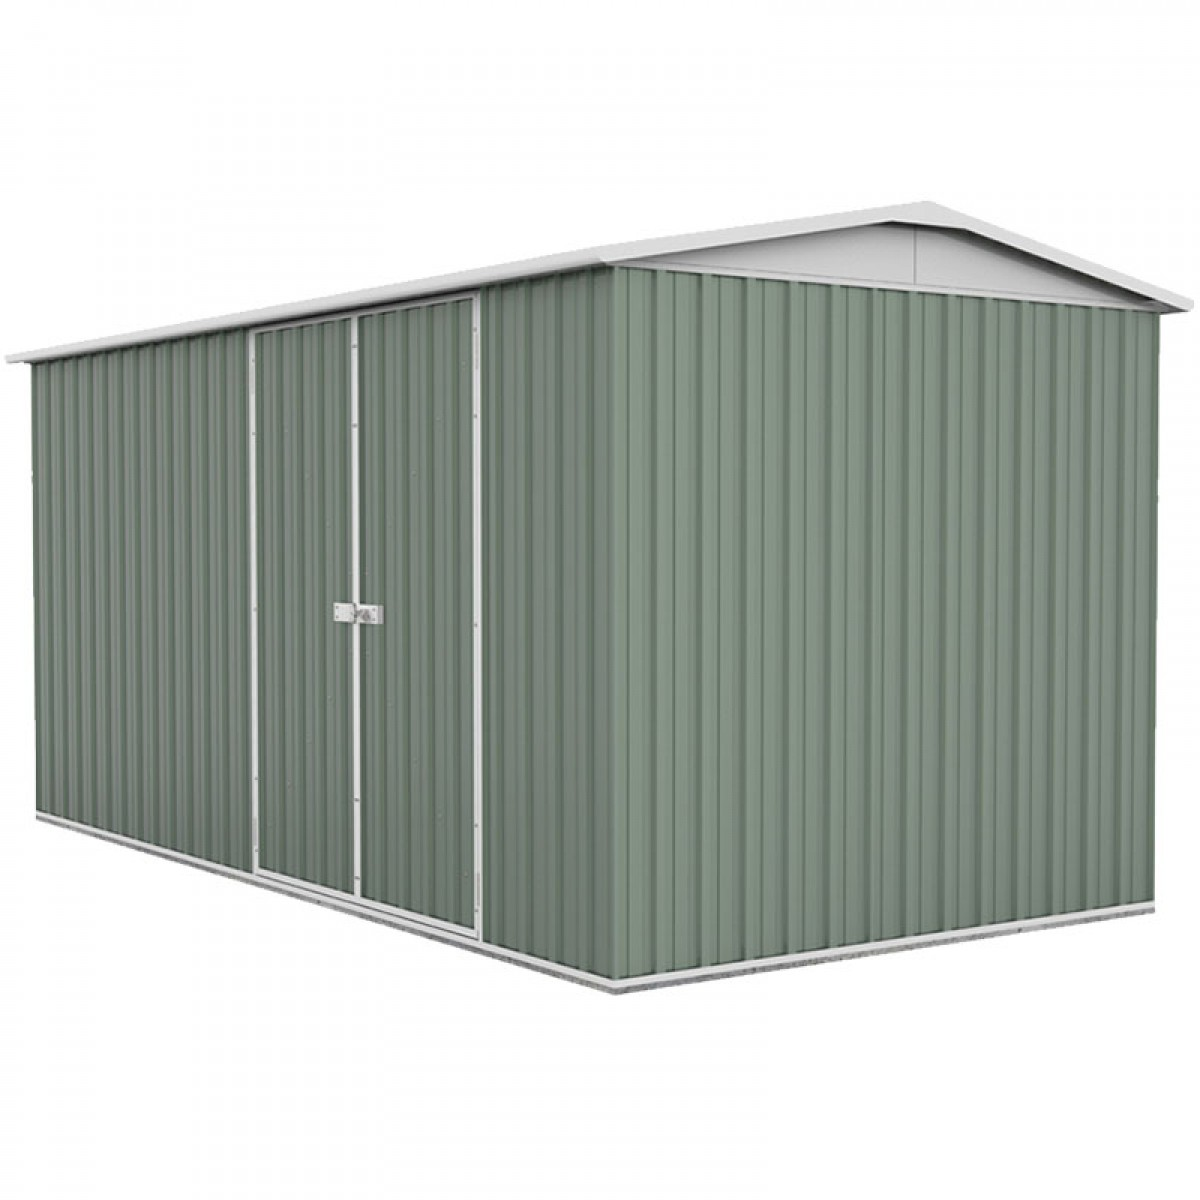 Absco highlander garden shed x x for Garden shed 4 x 2